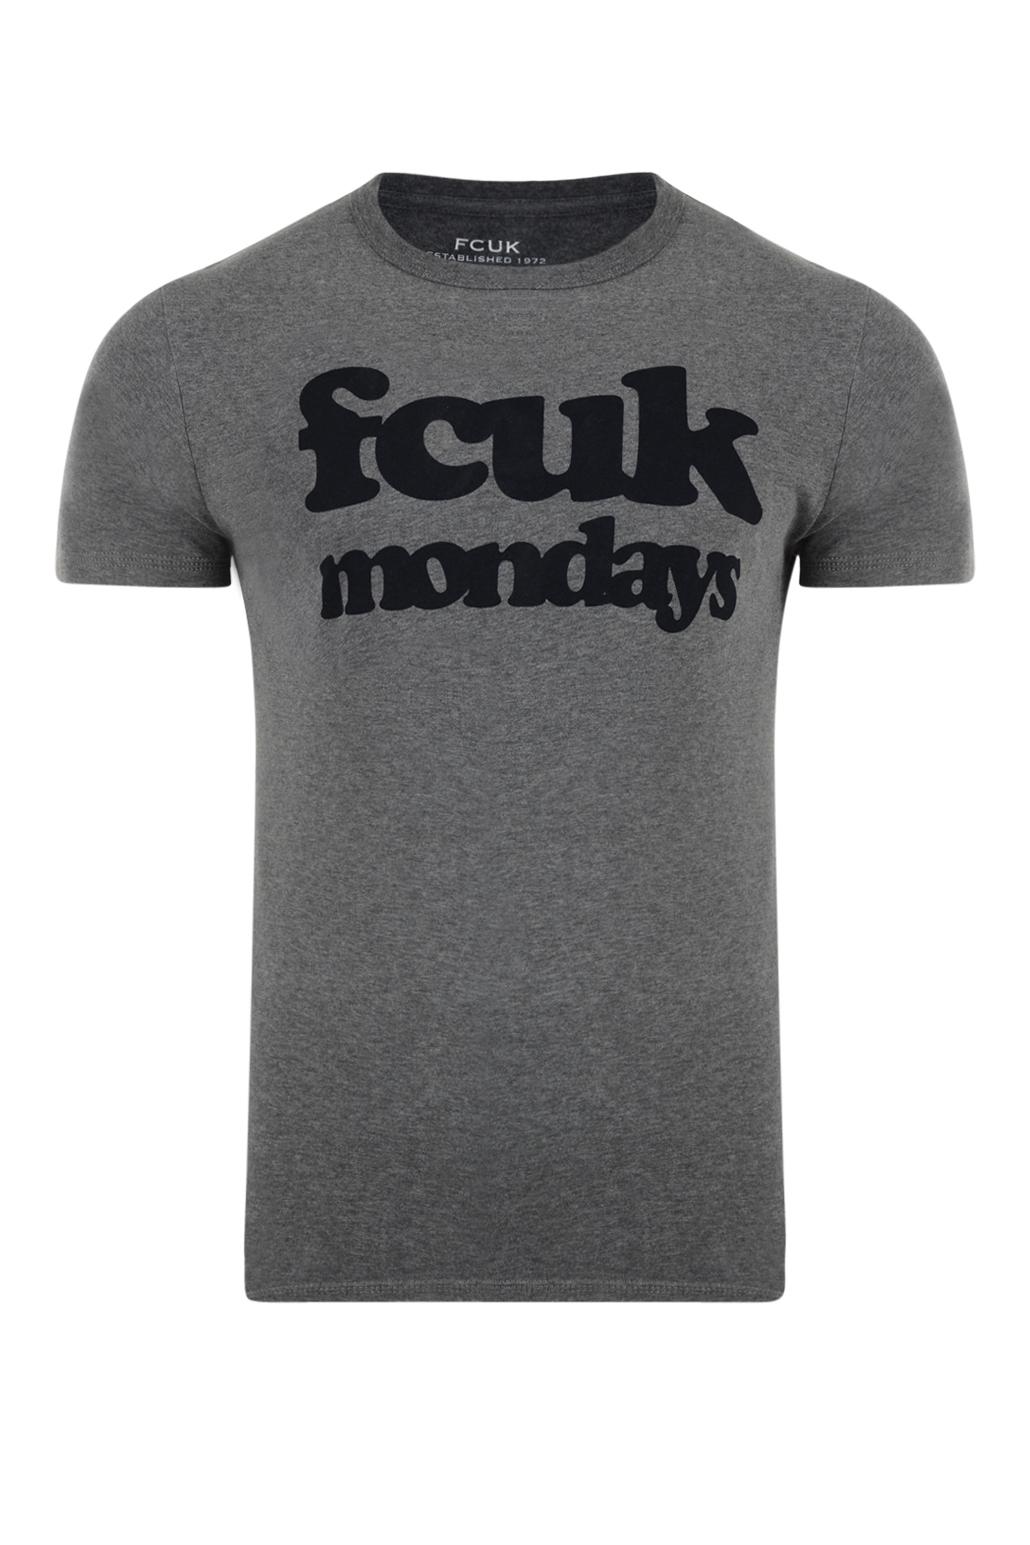 Bnwt Femme Fcuk designer French Connection Col V T shirt top bleu moyen